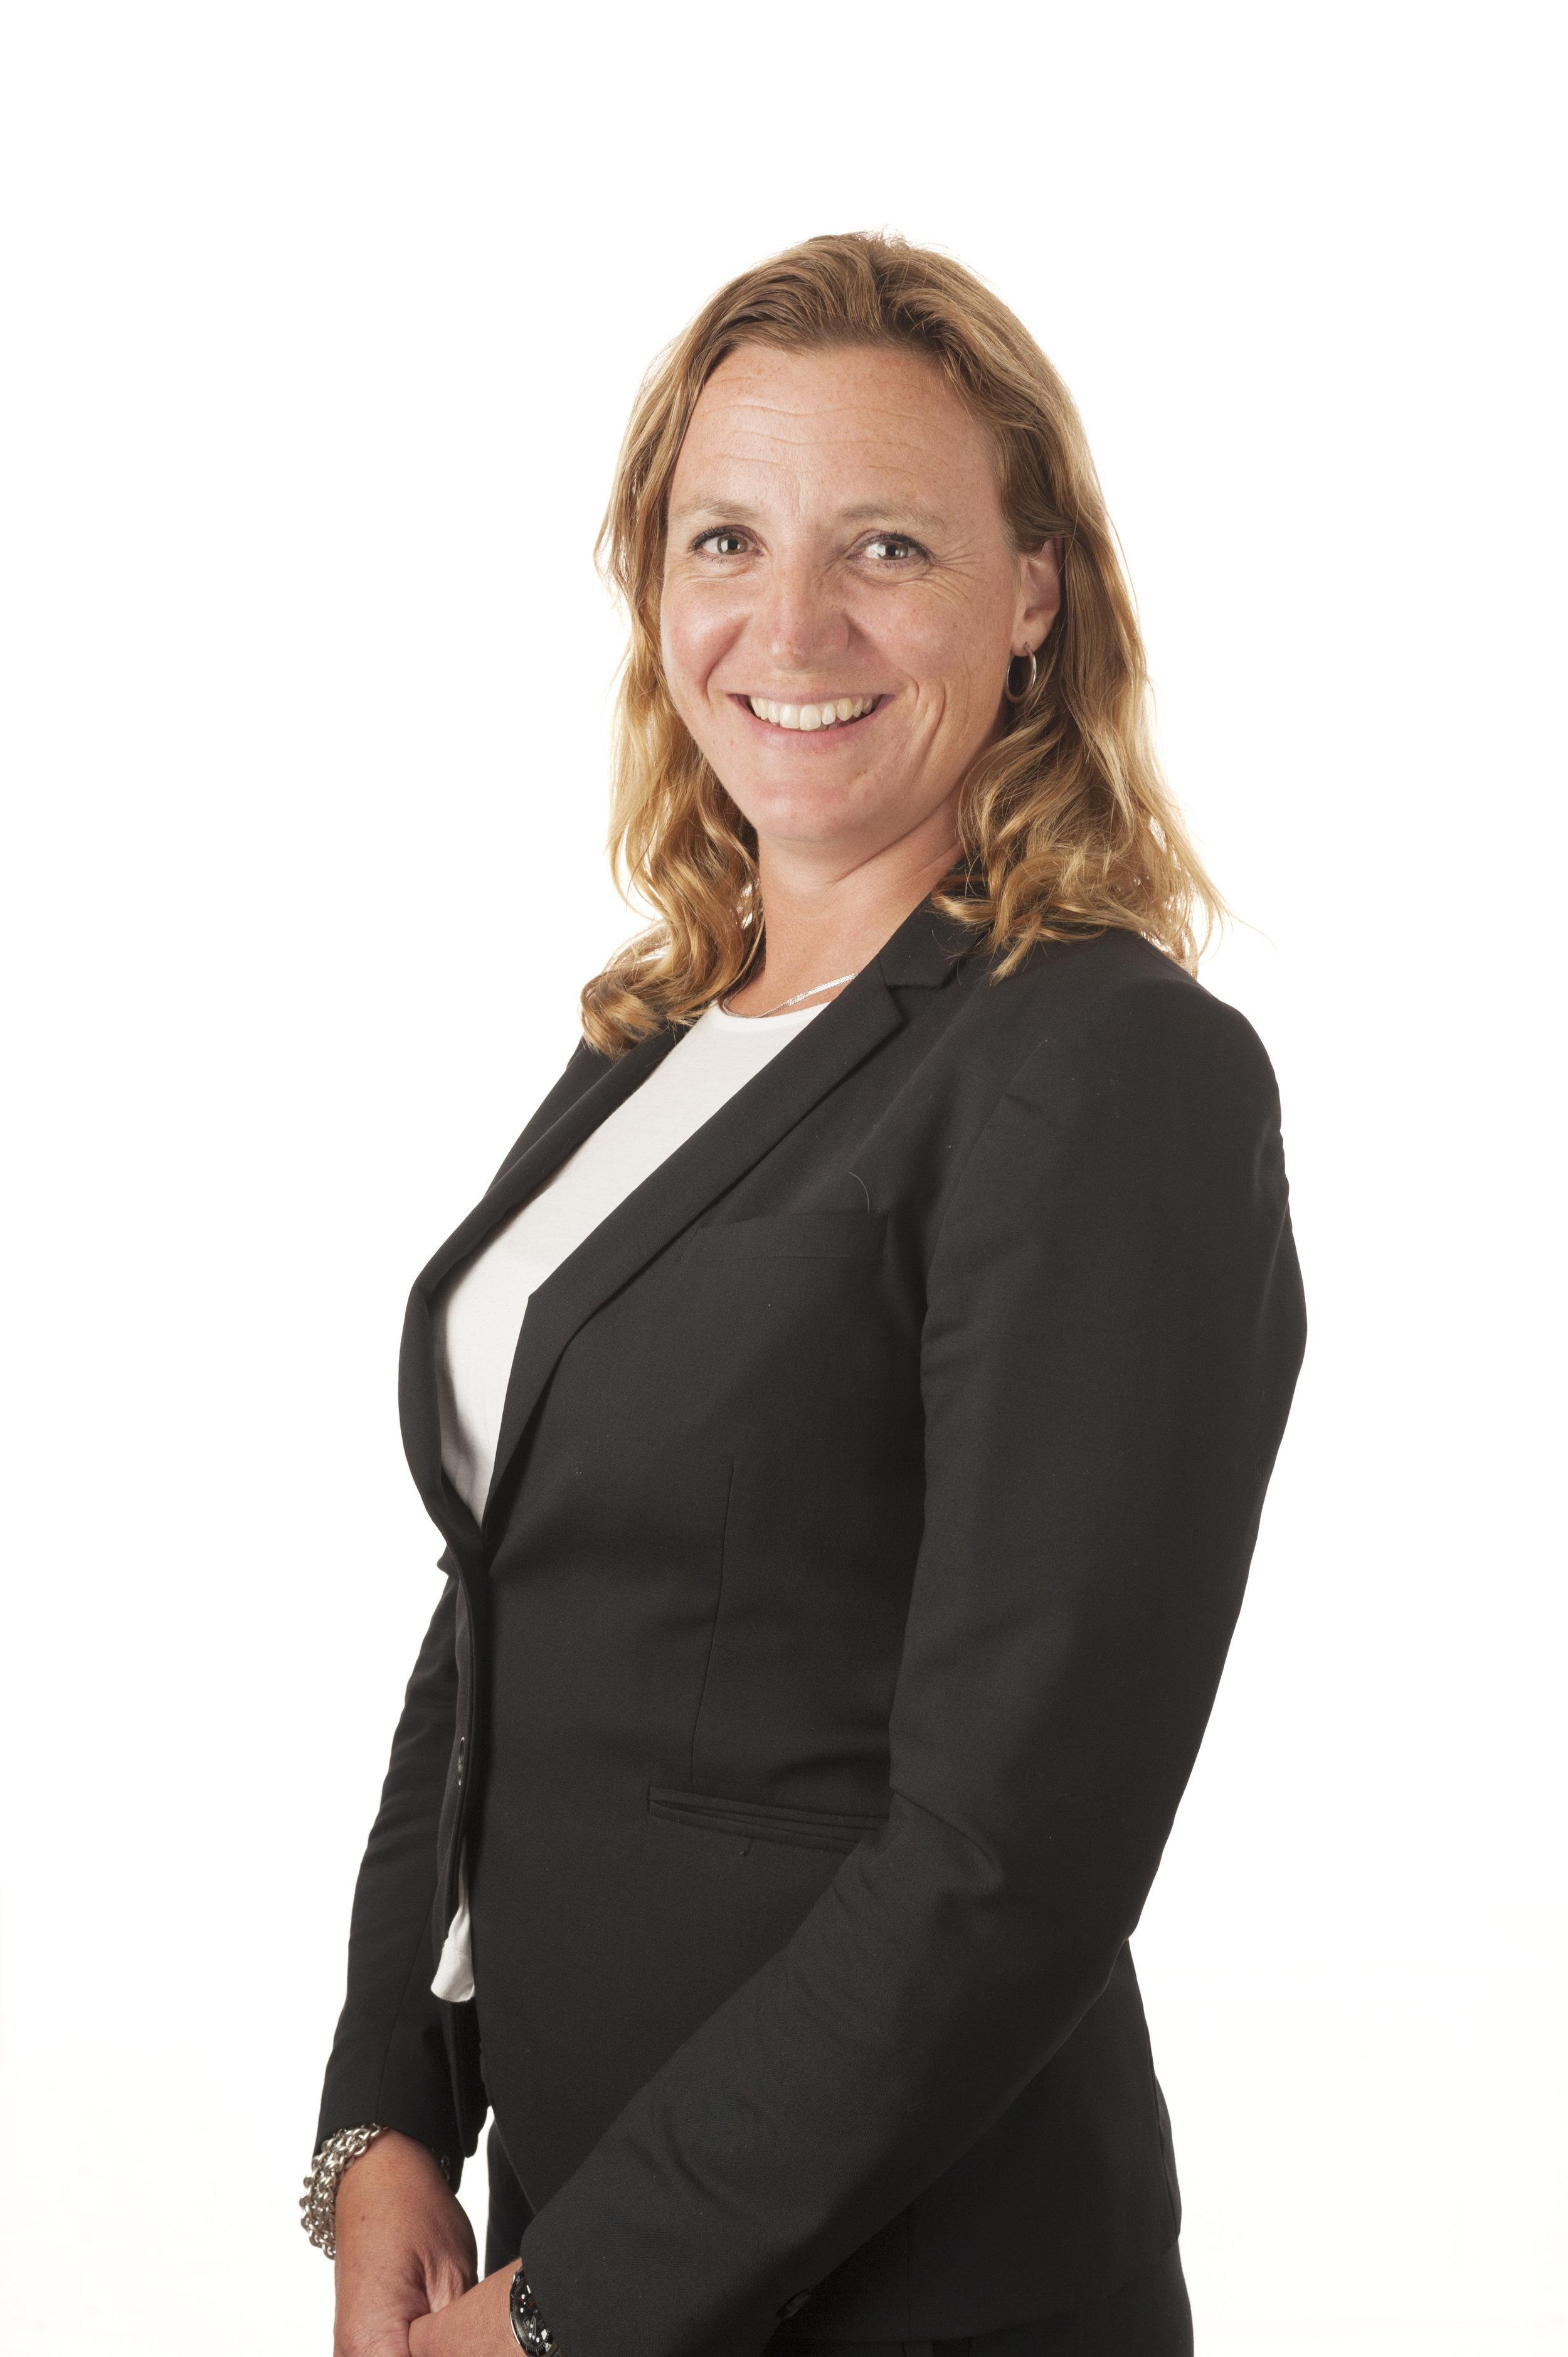 Kristina Bors, HR-direktør, BDO